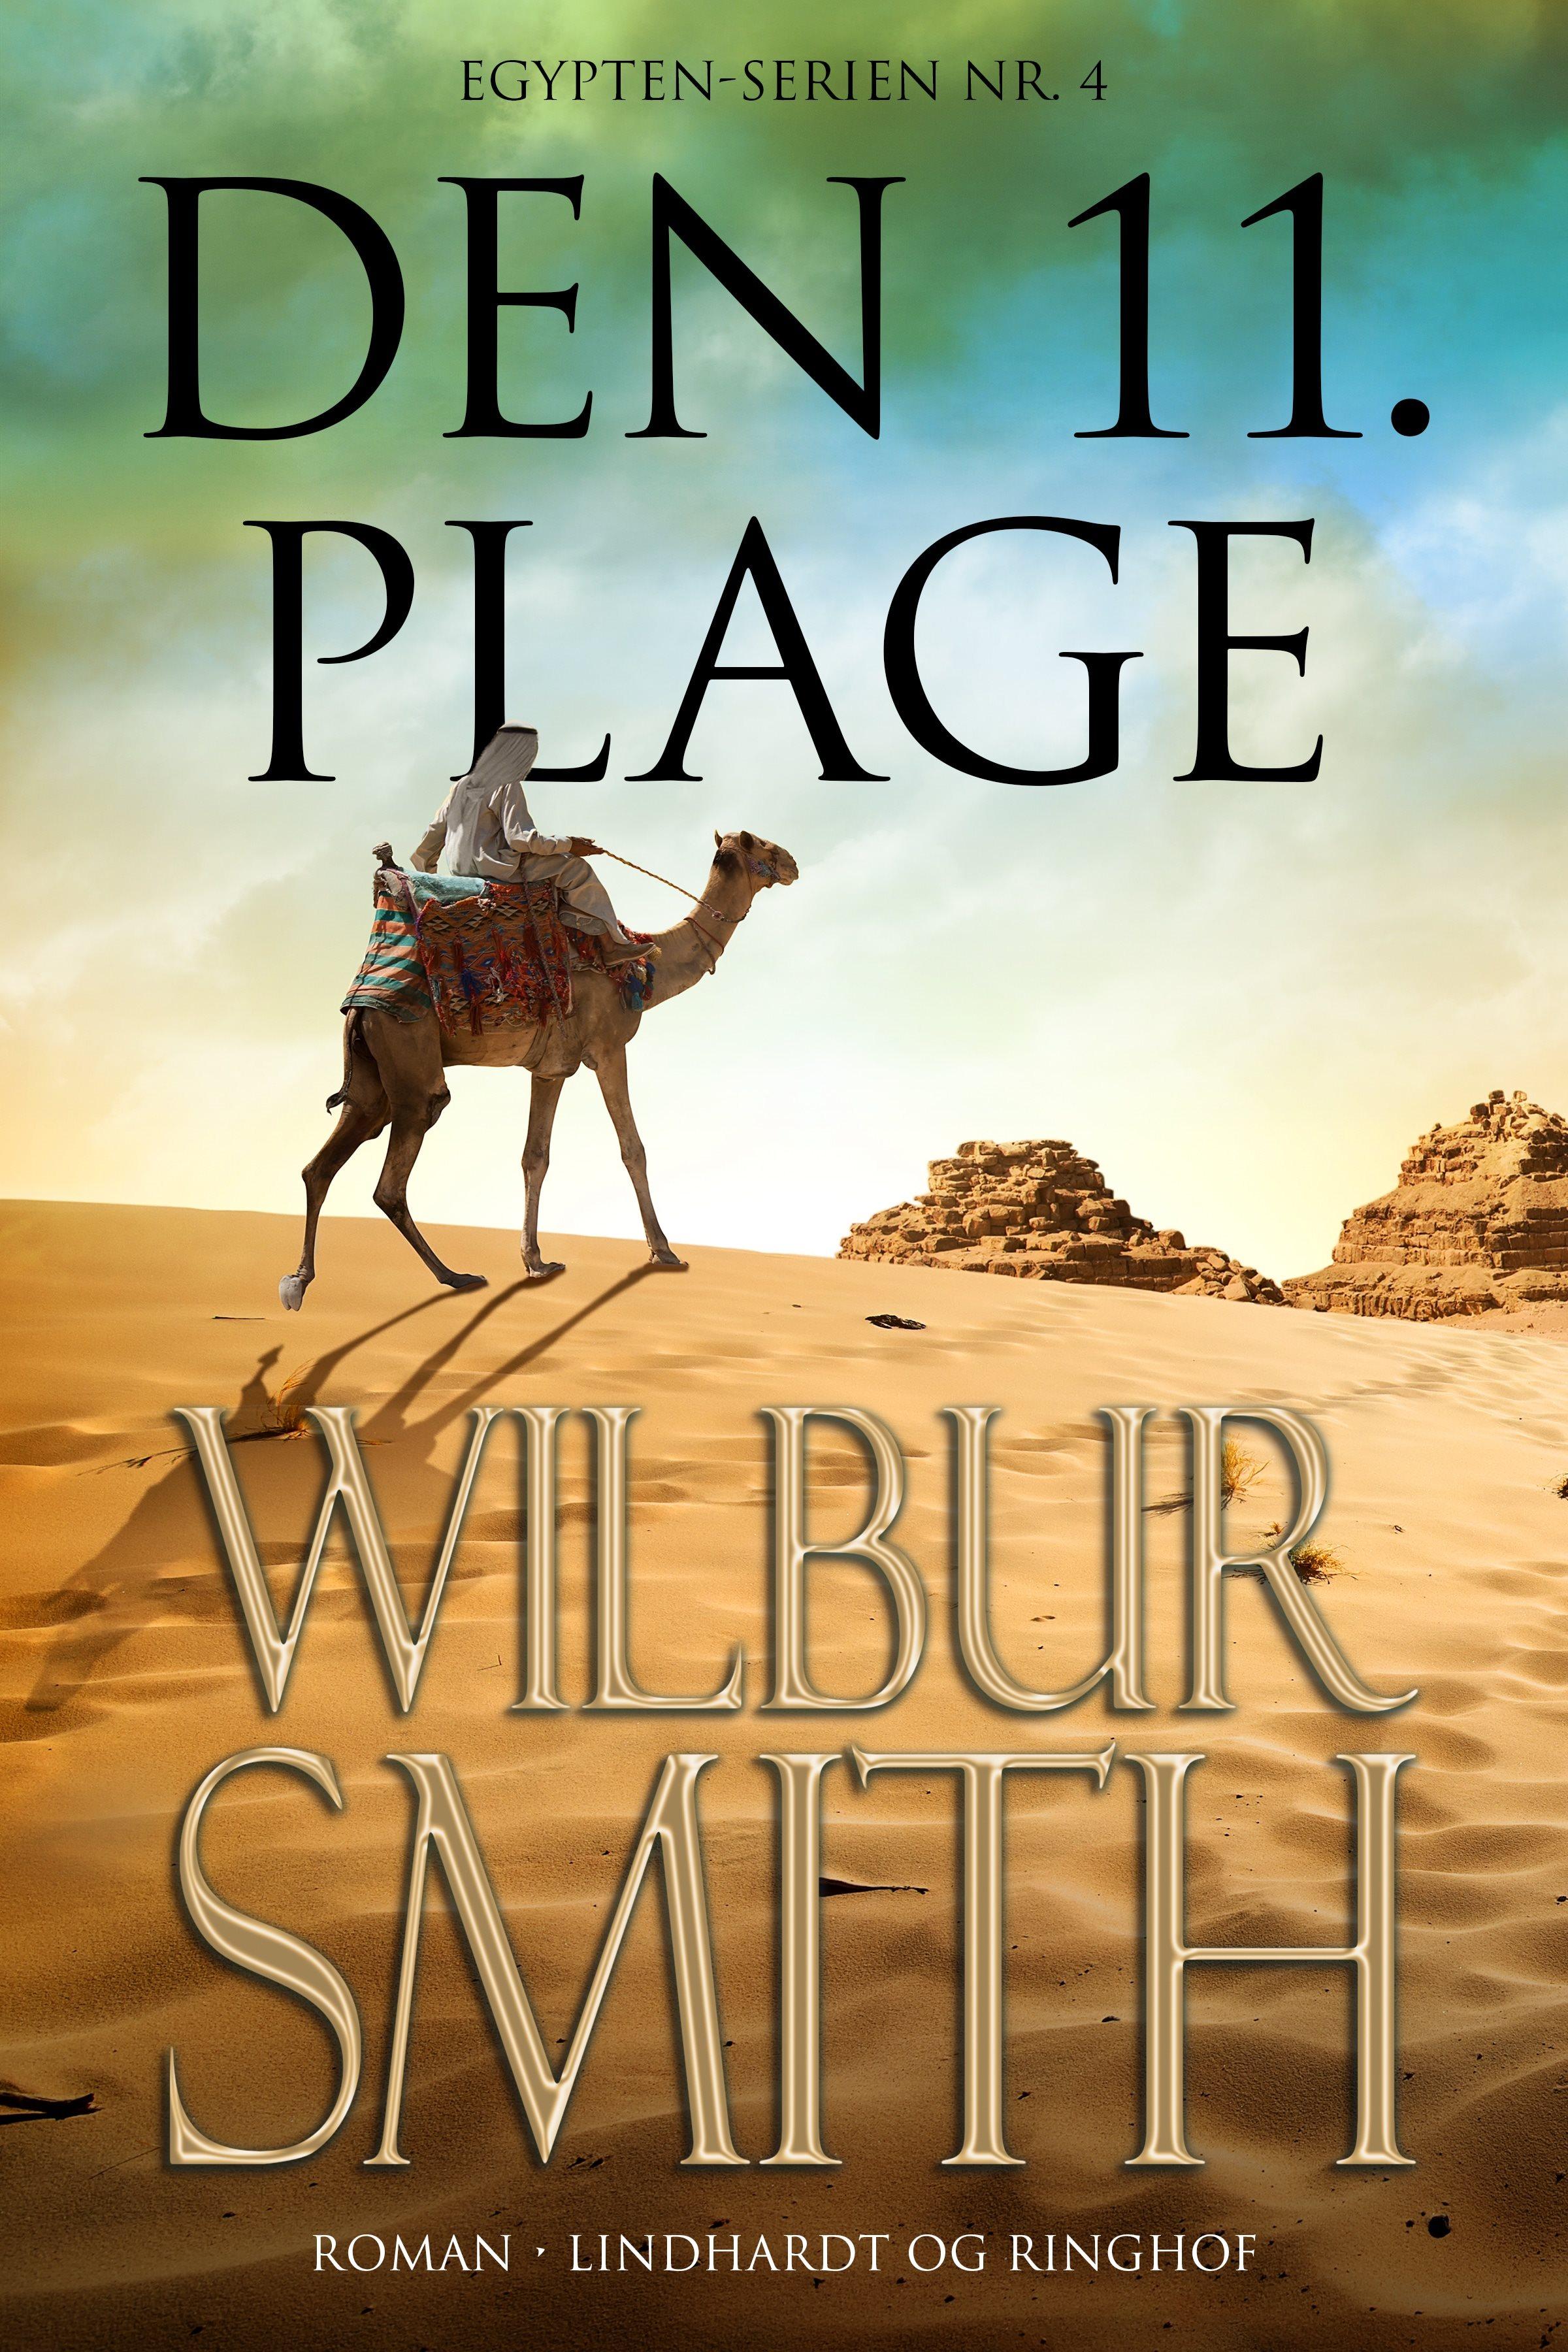 Wilbur Smith, Den 11. plage, Egypten-serien